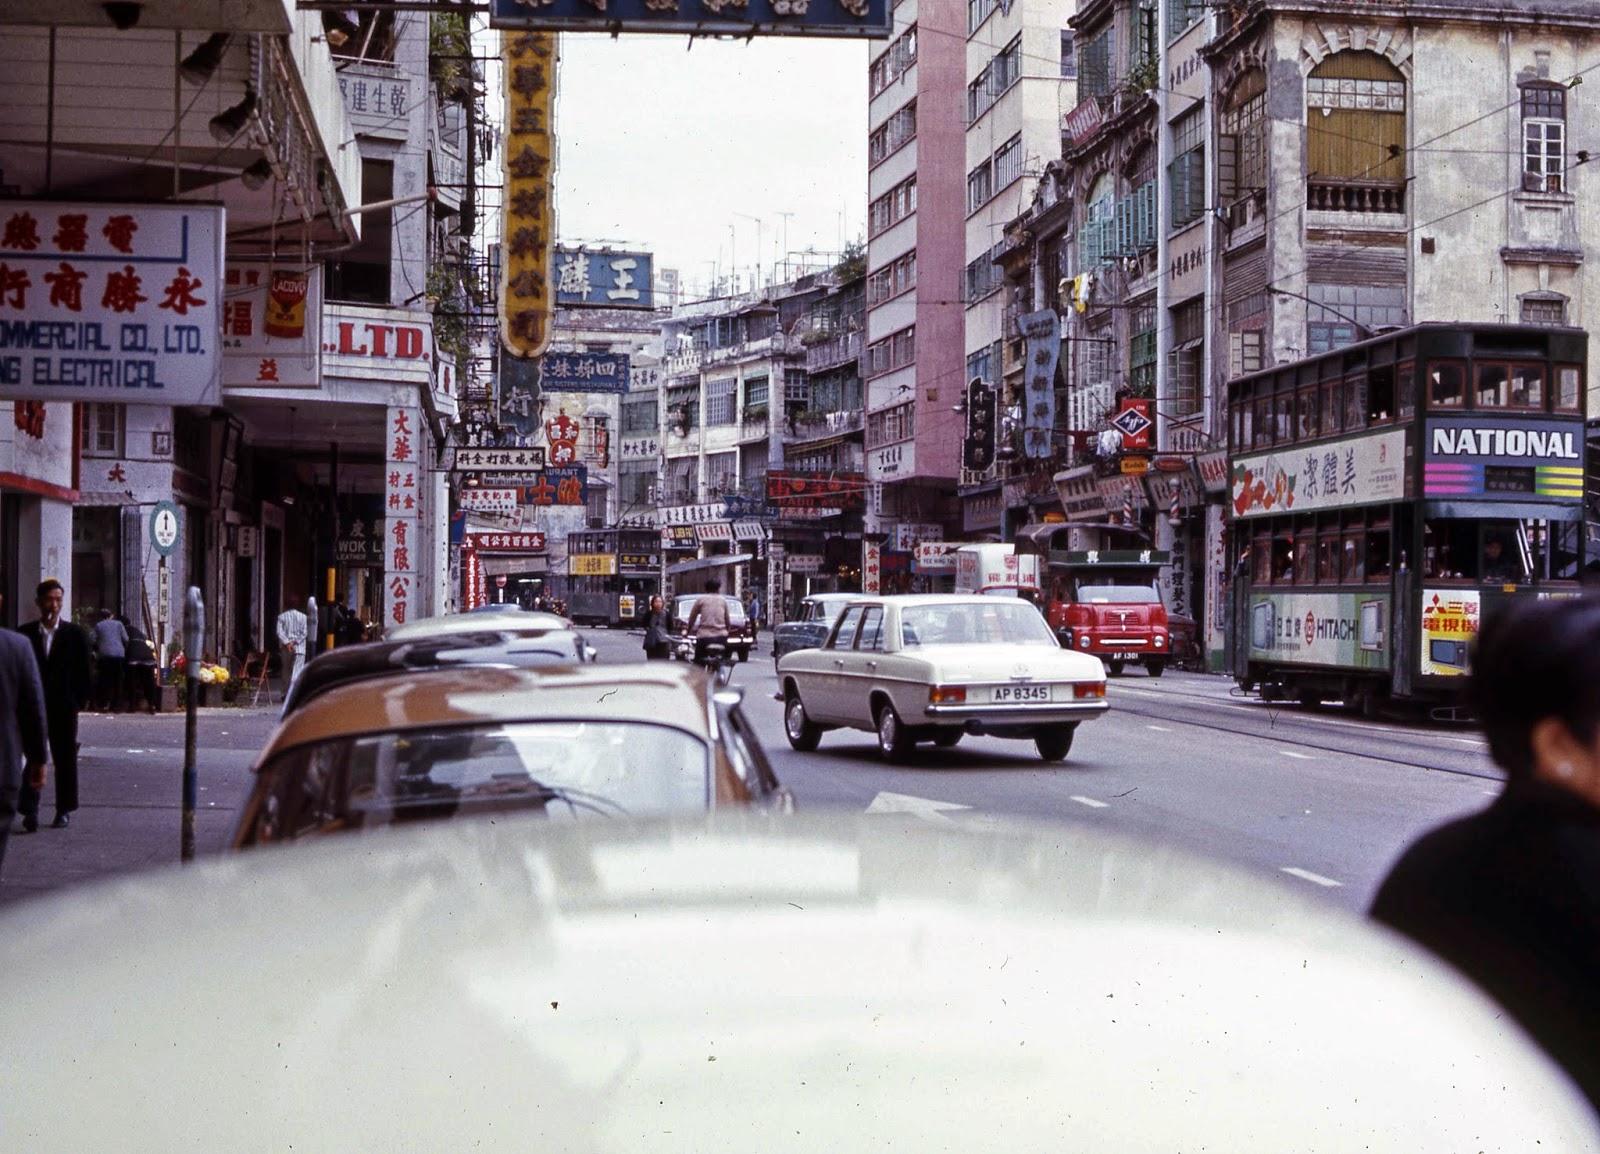 Busy Hong Kong street Mercedes and Double Decker buses Hitachi - Hong Kong 1969